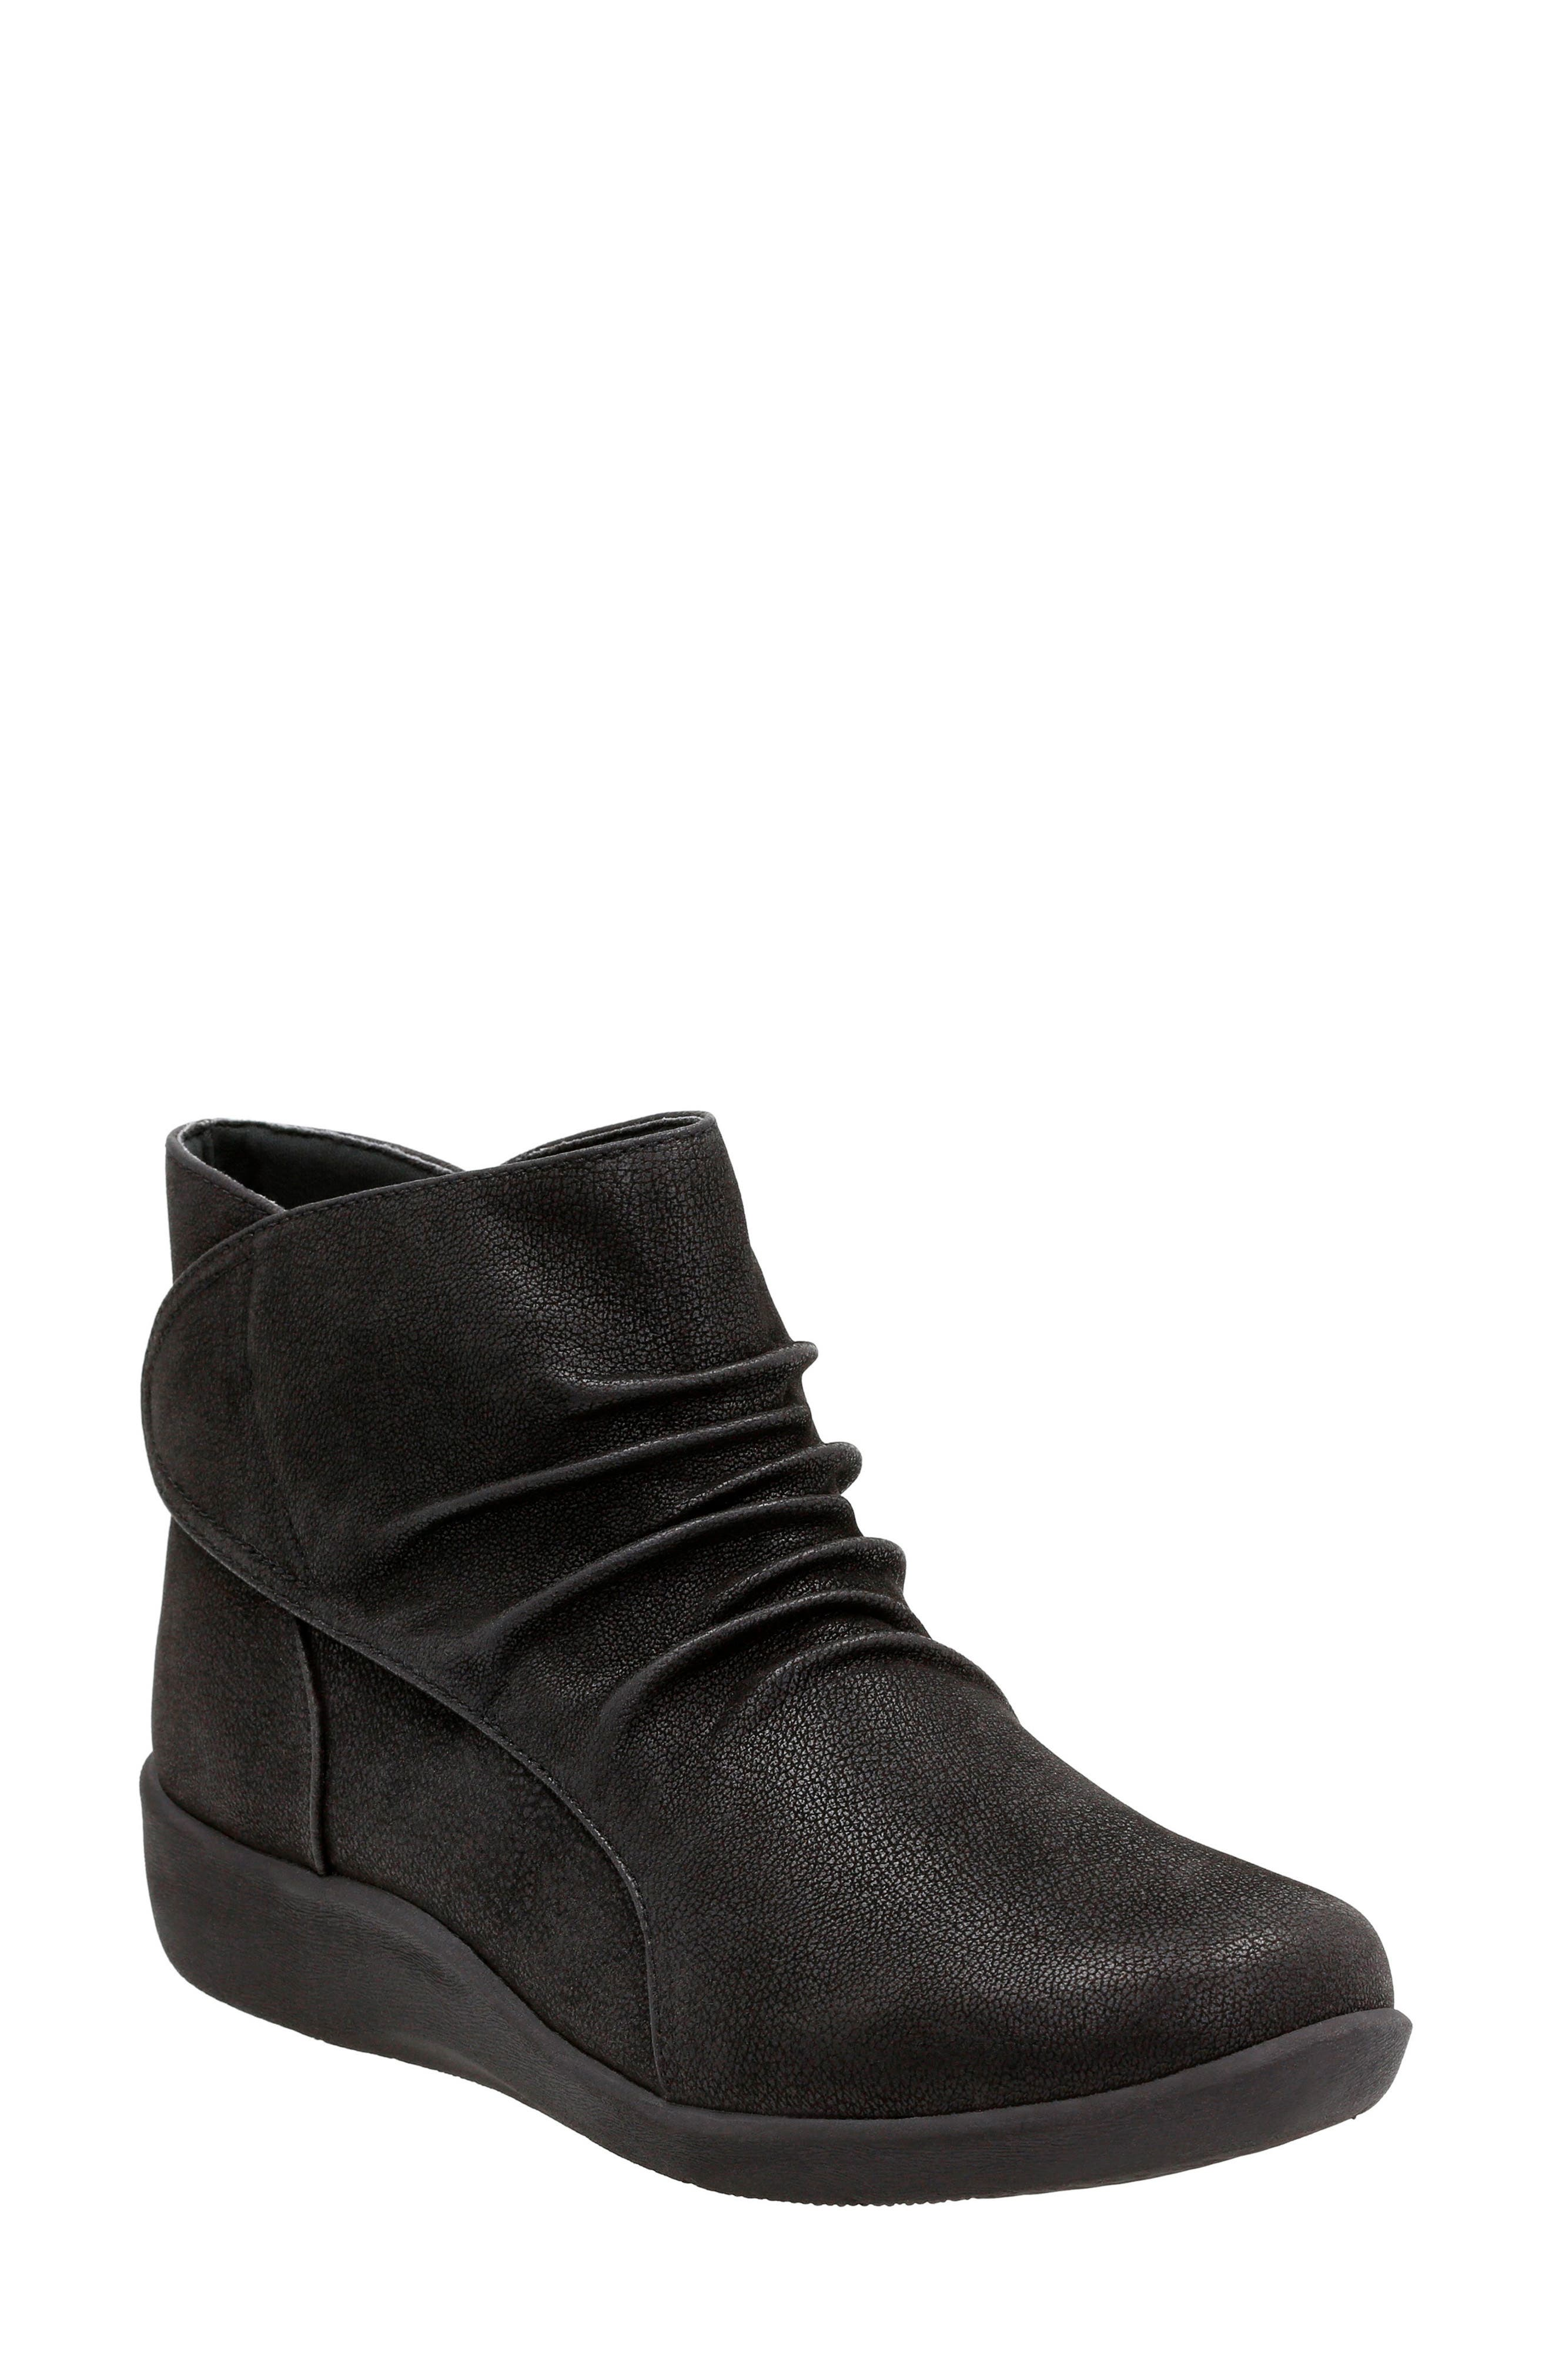 Main Image - Clarks® Sillian Sway Boot (Women)